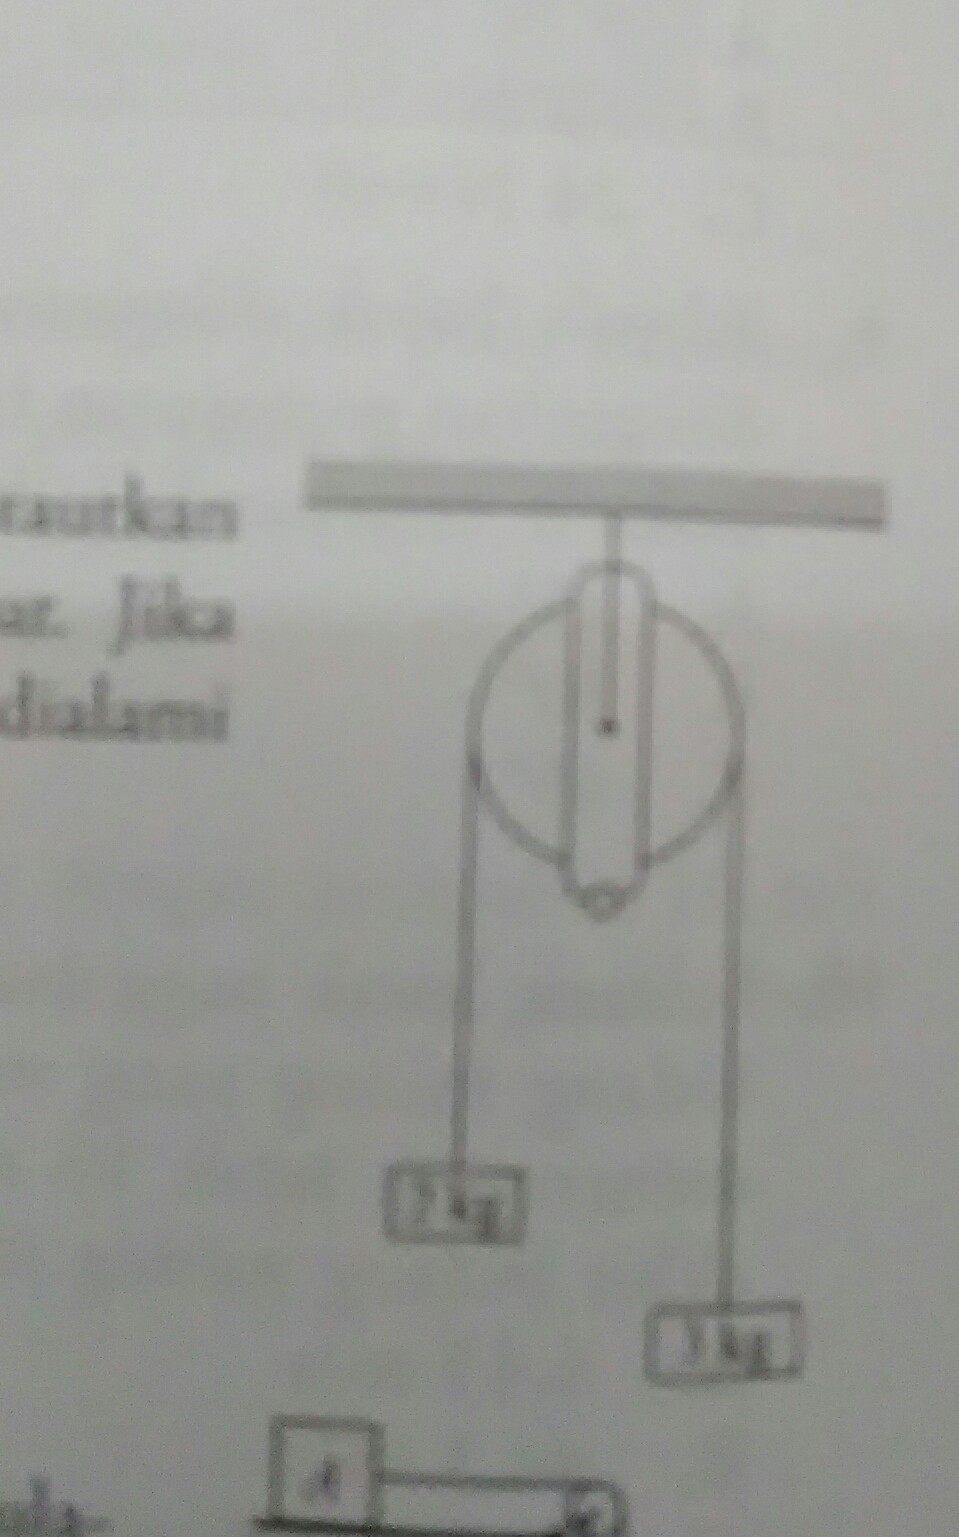 Dua buah benda bermassa 2kg dan 3kg diikat tali kemudian ditautkan dua buah benda bermassa 2kg dan 3kg diikat tali kemudian ditautkan pada katrol yang massanya diabaikan seperti pada gambar jika besar percepatan gravitasi ccuart Choice Image